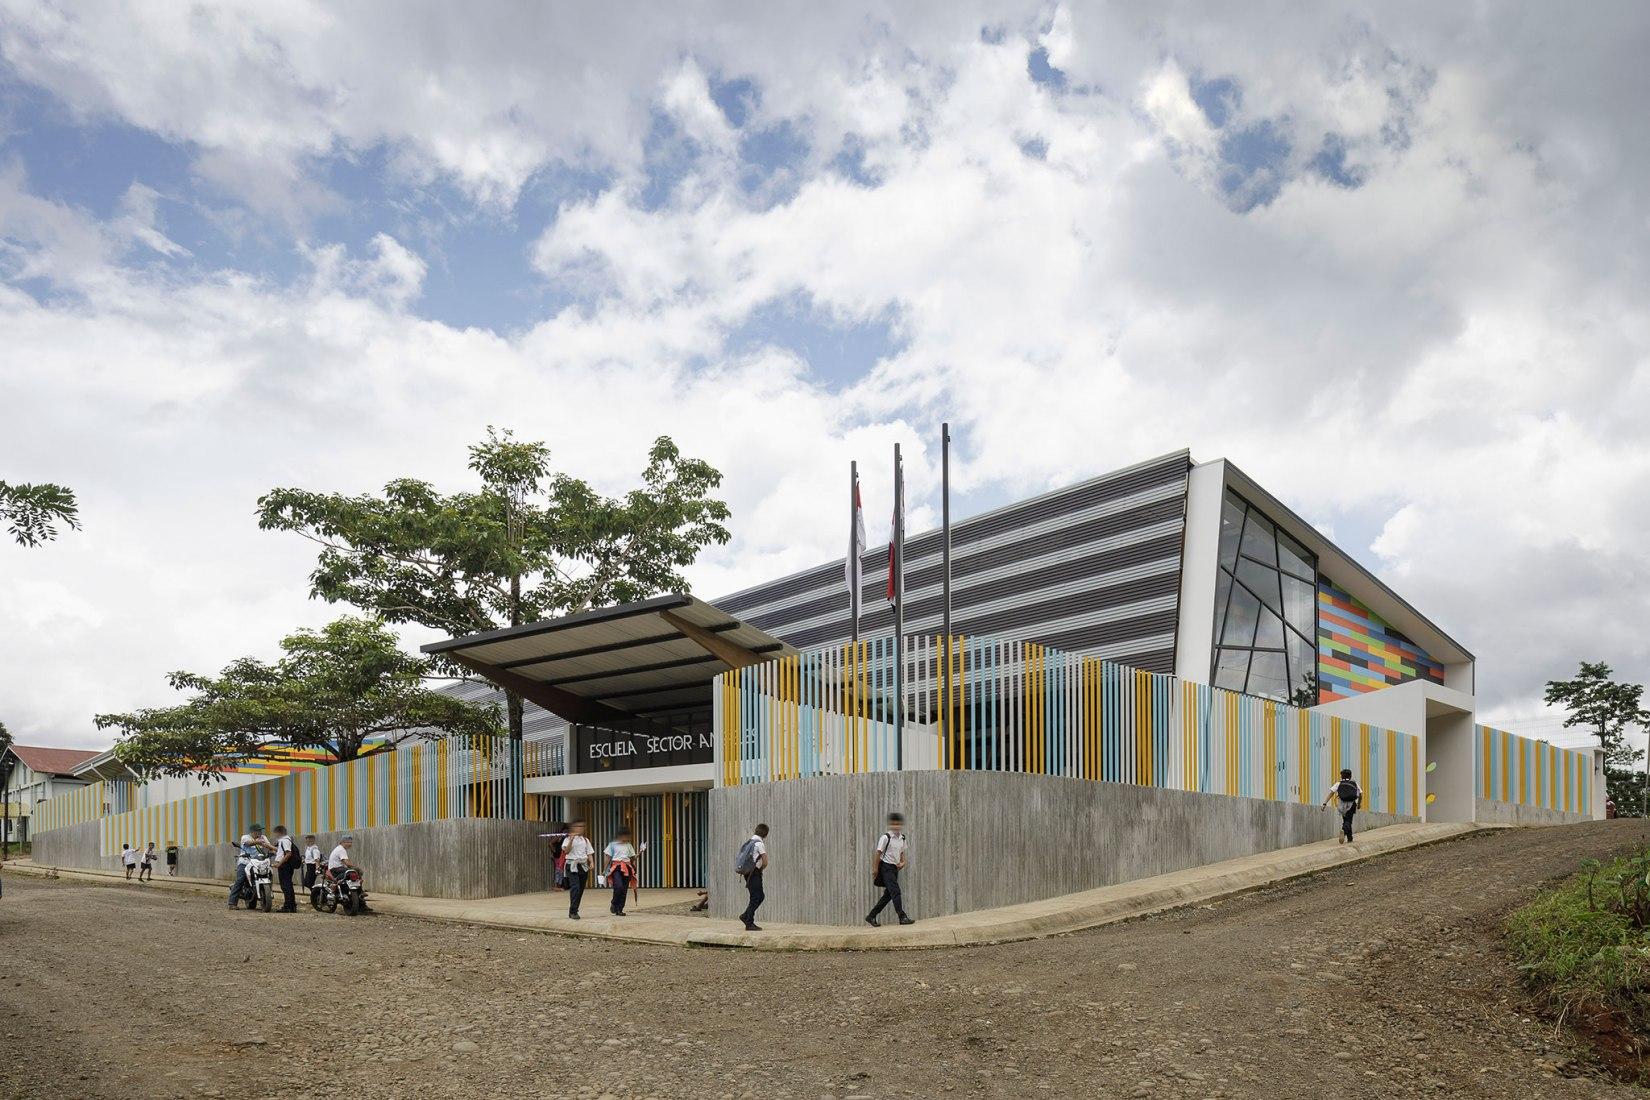 A public school in the rainforest of Costa Rica by Norte Sur Arquitectos. Photograph by Fernando Alda